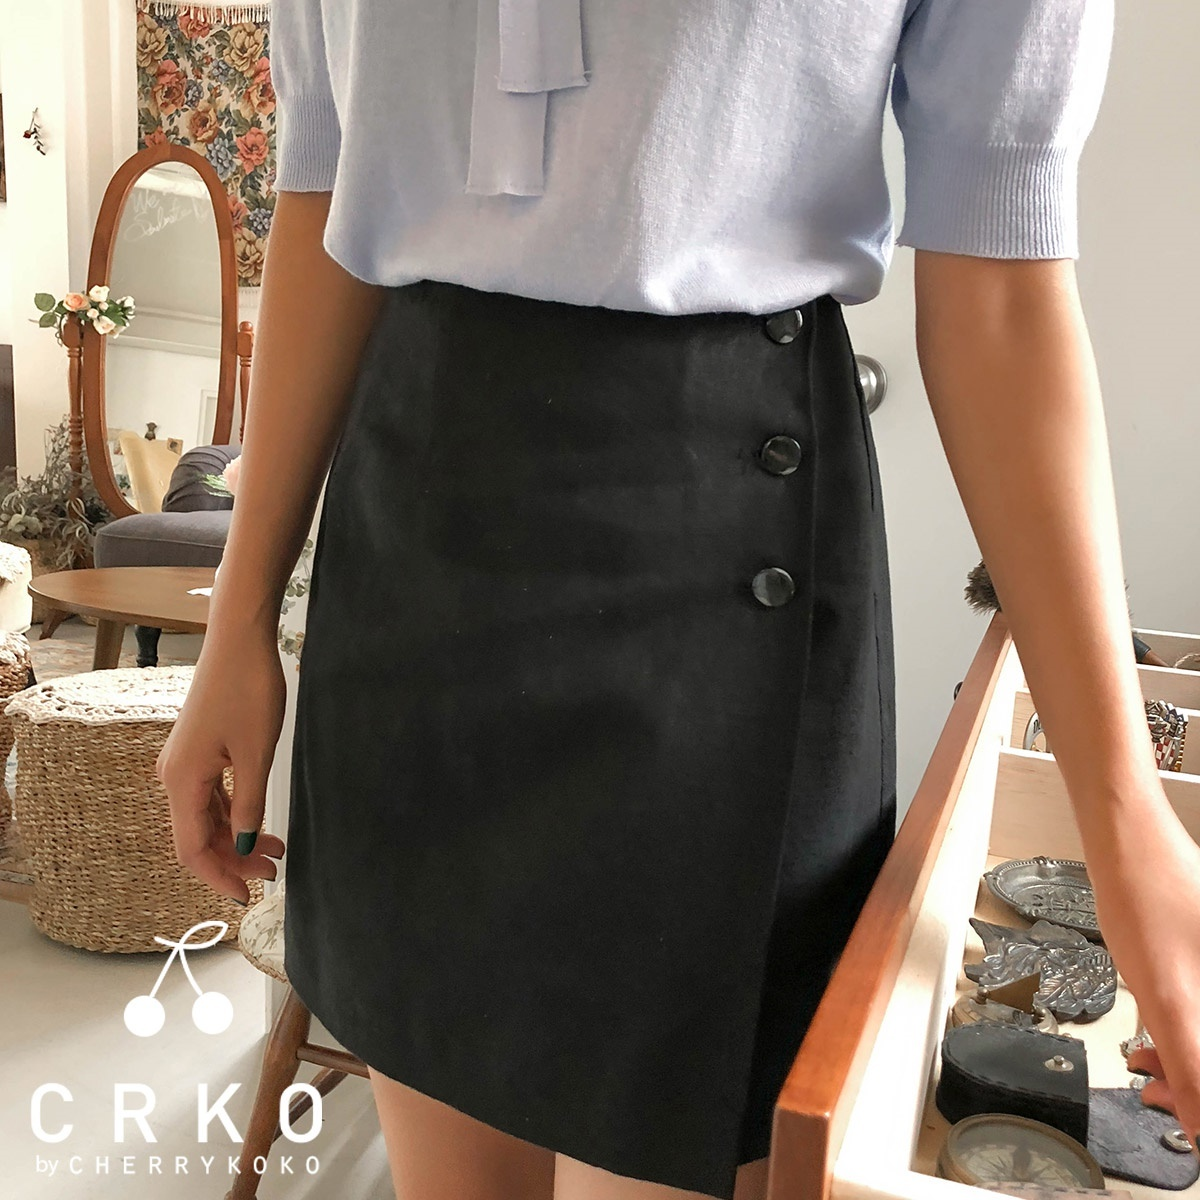 [CHERRYKOKO官方旗艦店] 時尚黑色迷你裙 / marvella skirt